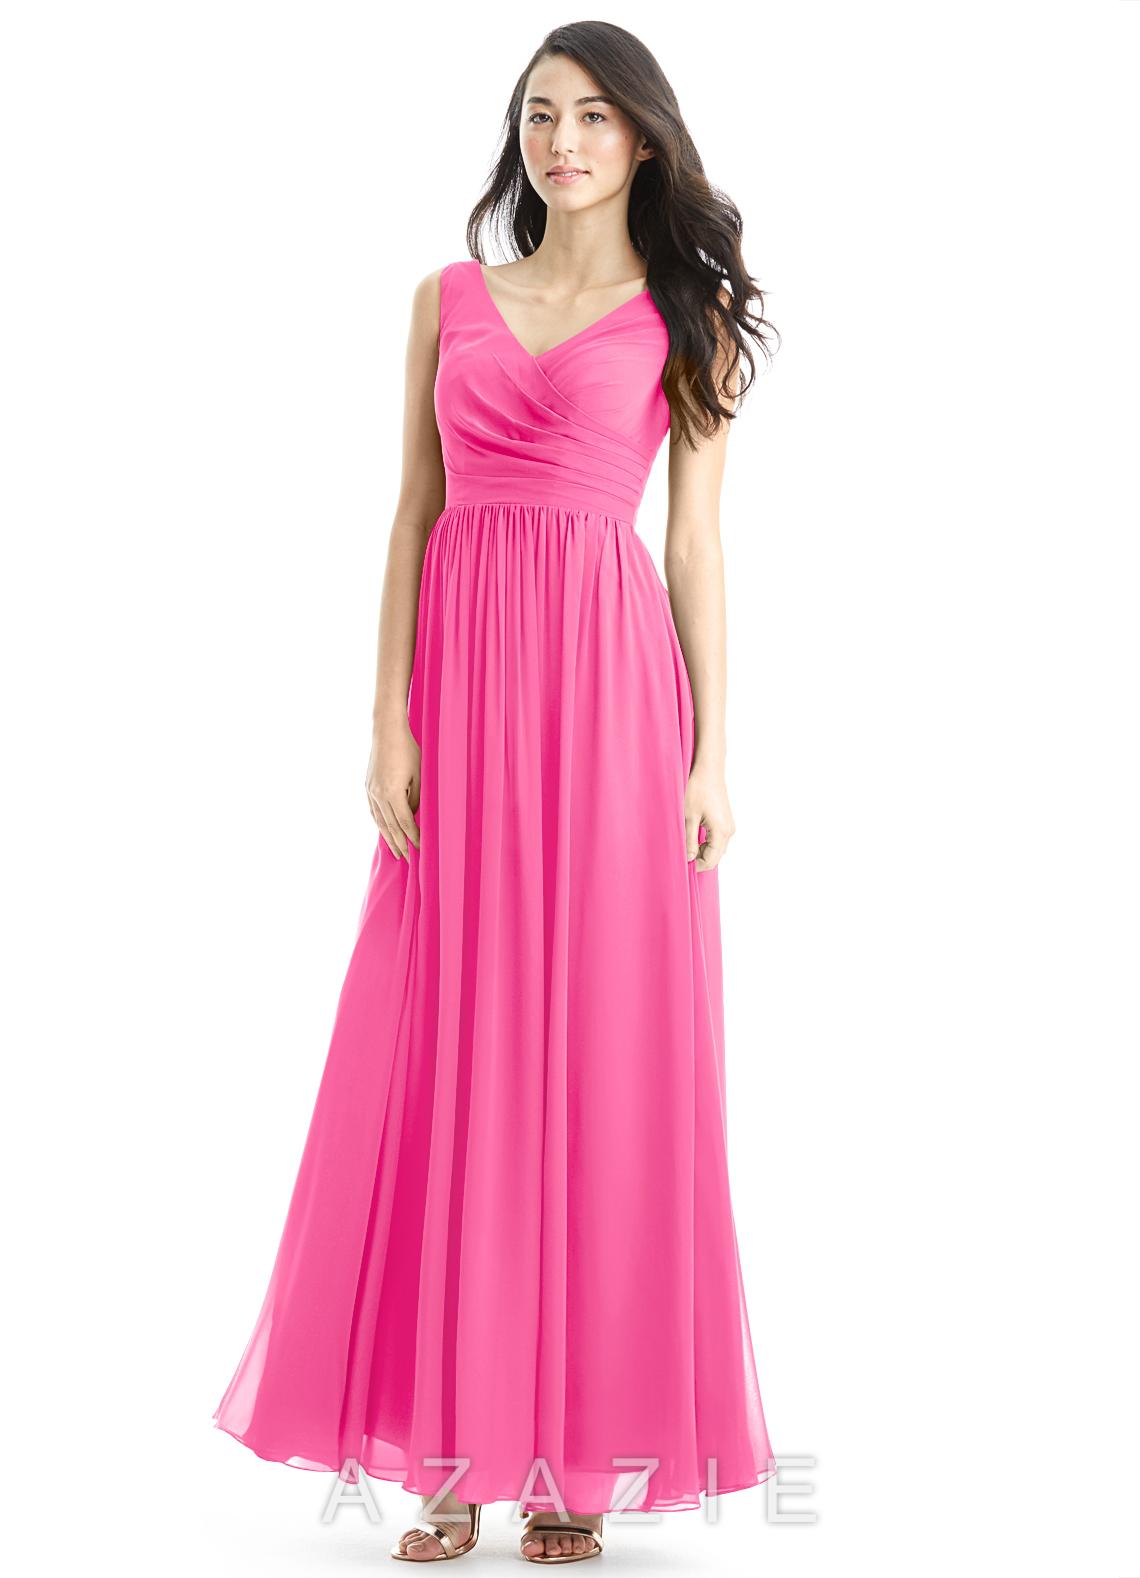 Azalea bridesmaid dresses azalea gowns azazie azazie keyla azazie keyla ombrellifo Image collections